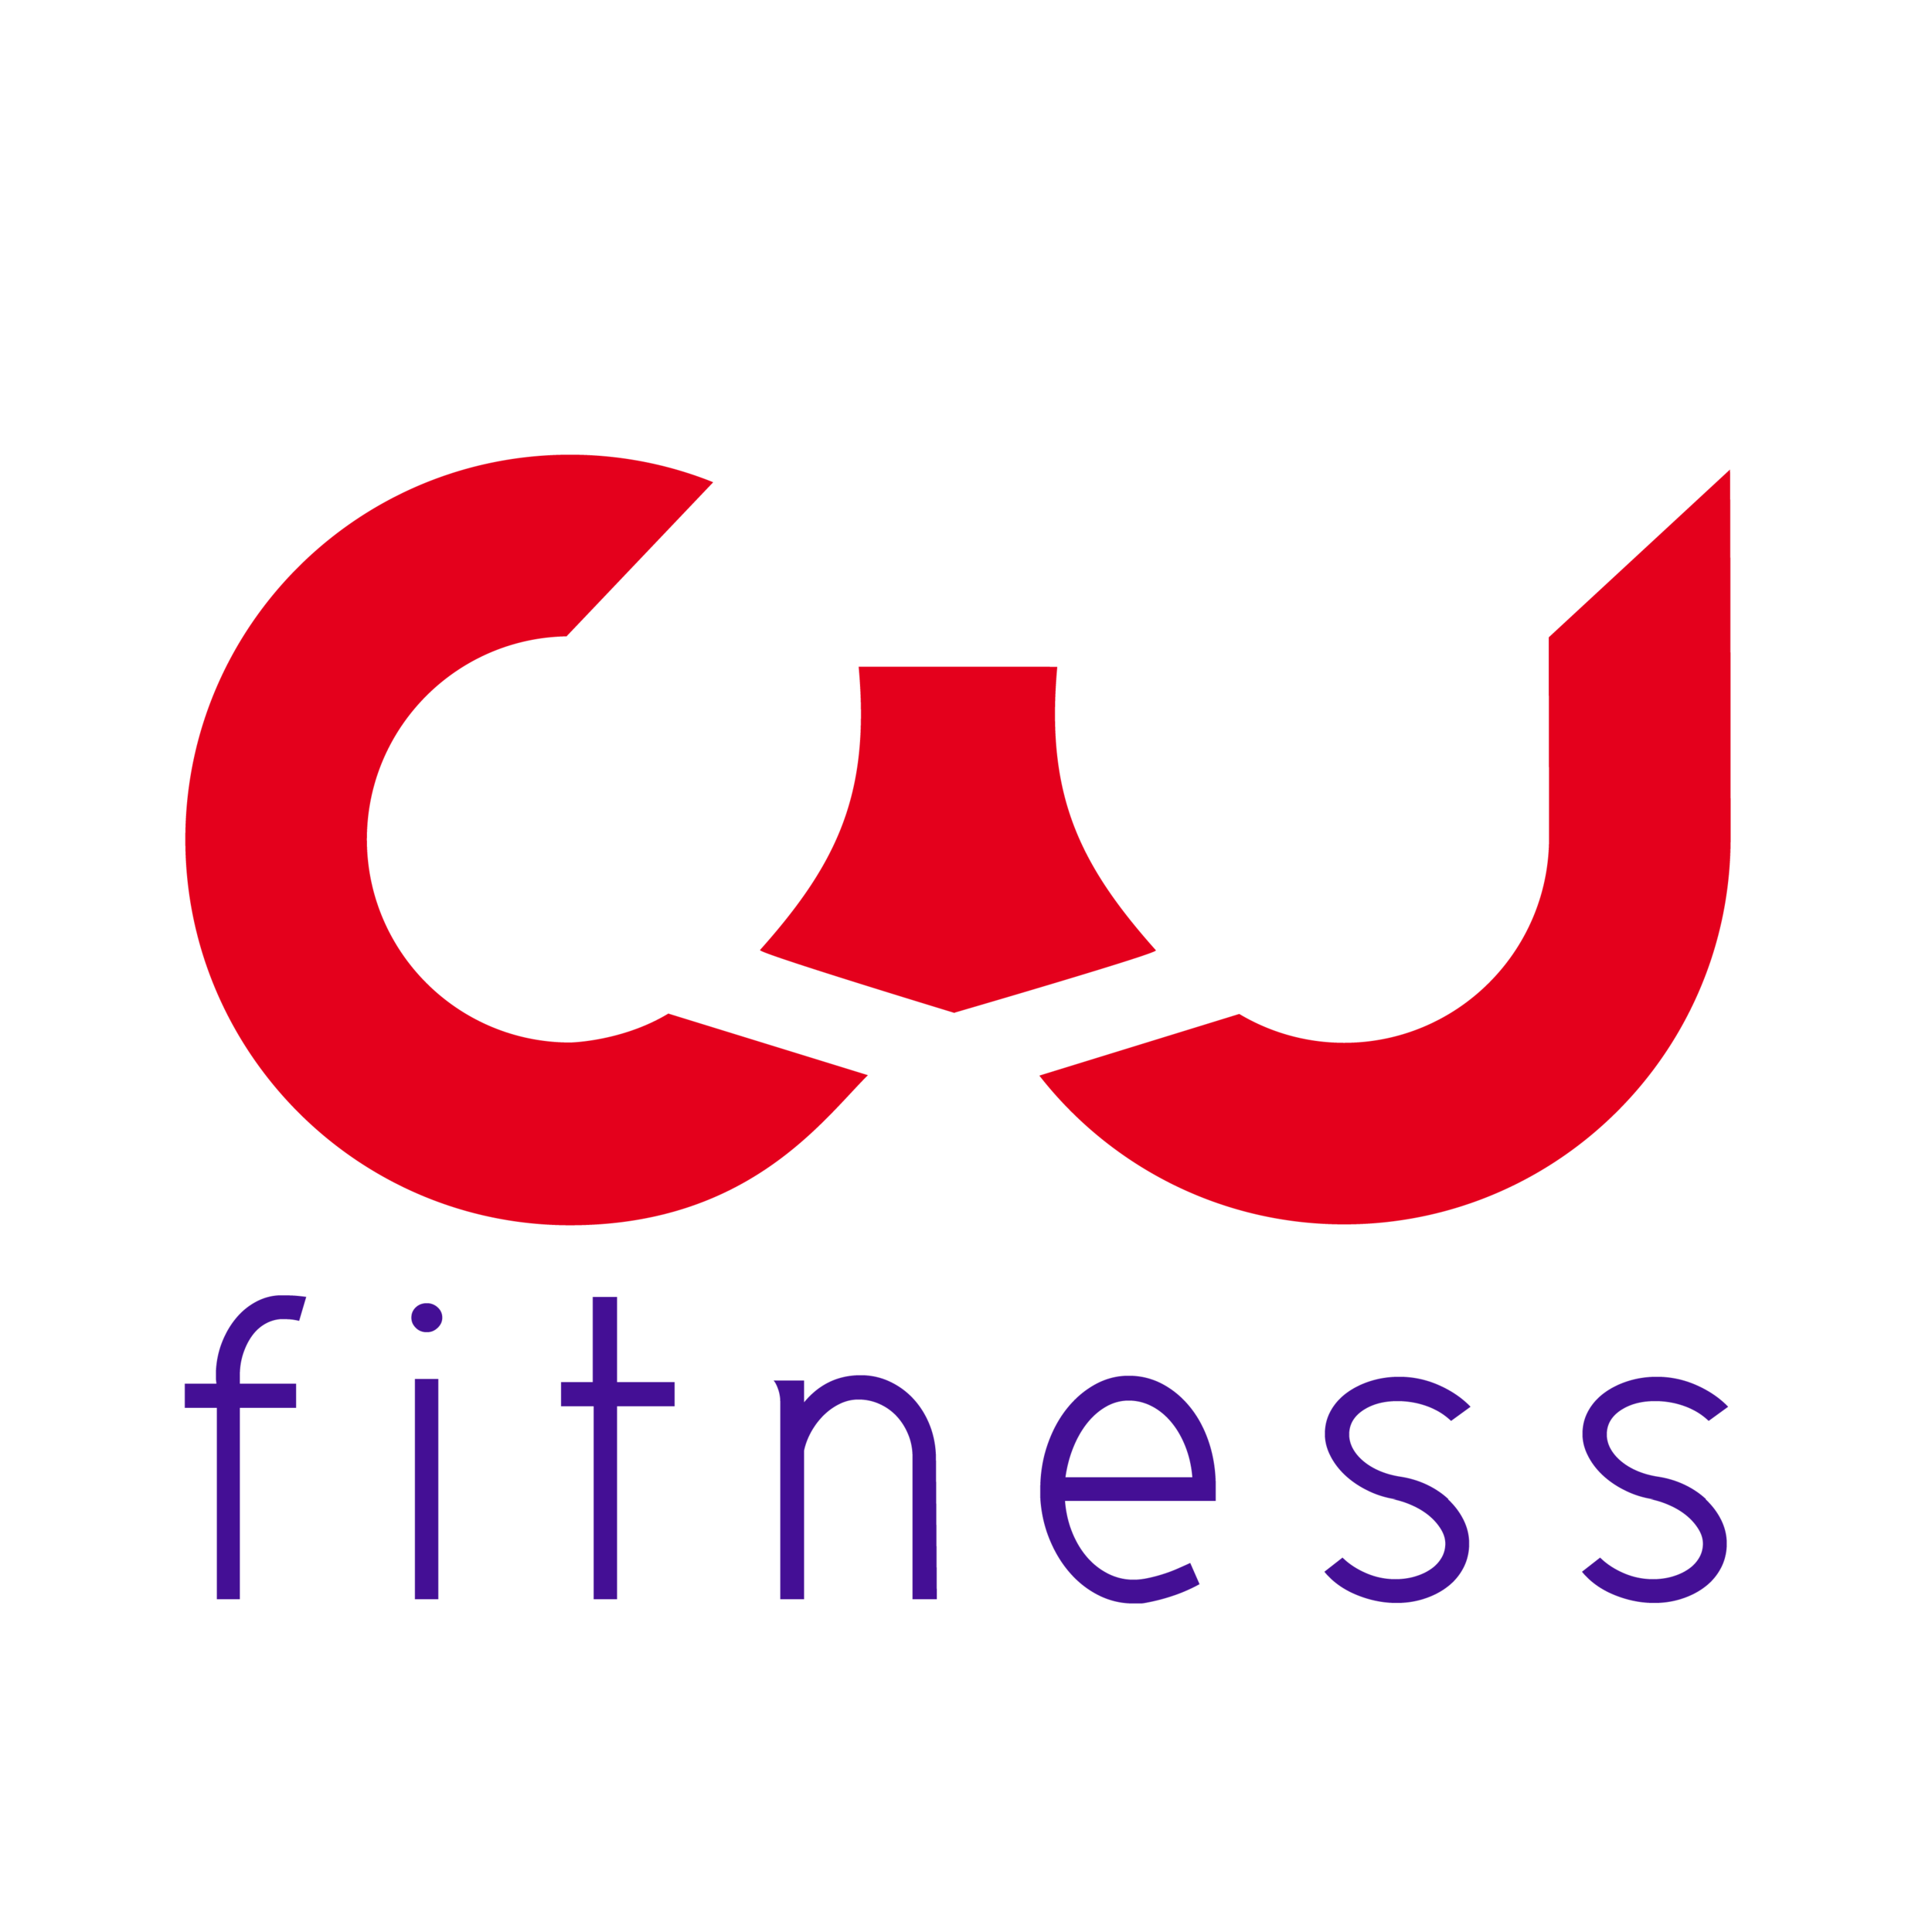 CW-final logo-02.png